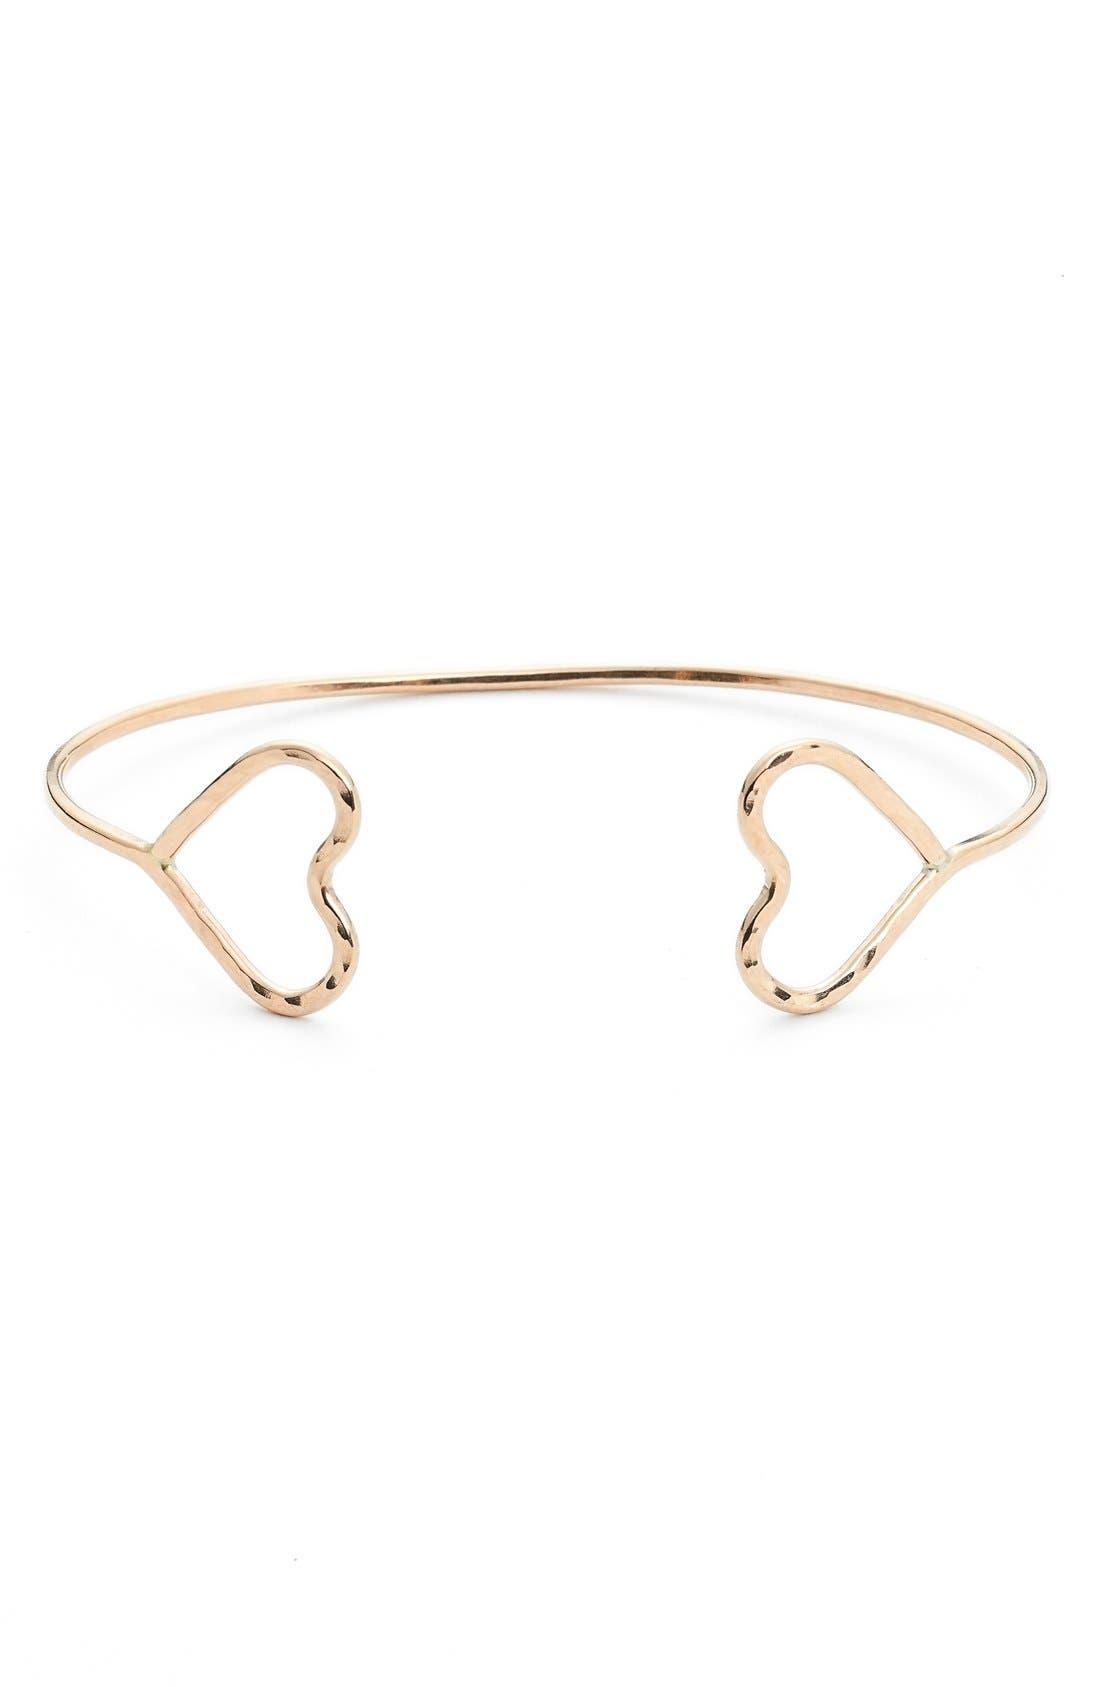 Main Image - Nashelle 14k-Gold Fill Open Heart Cuff Bracelet